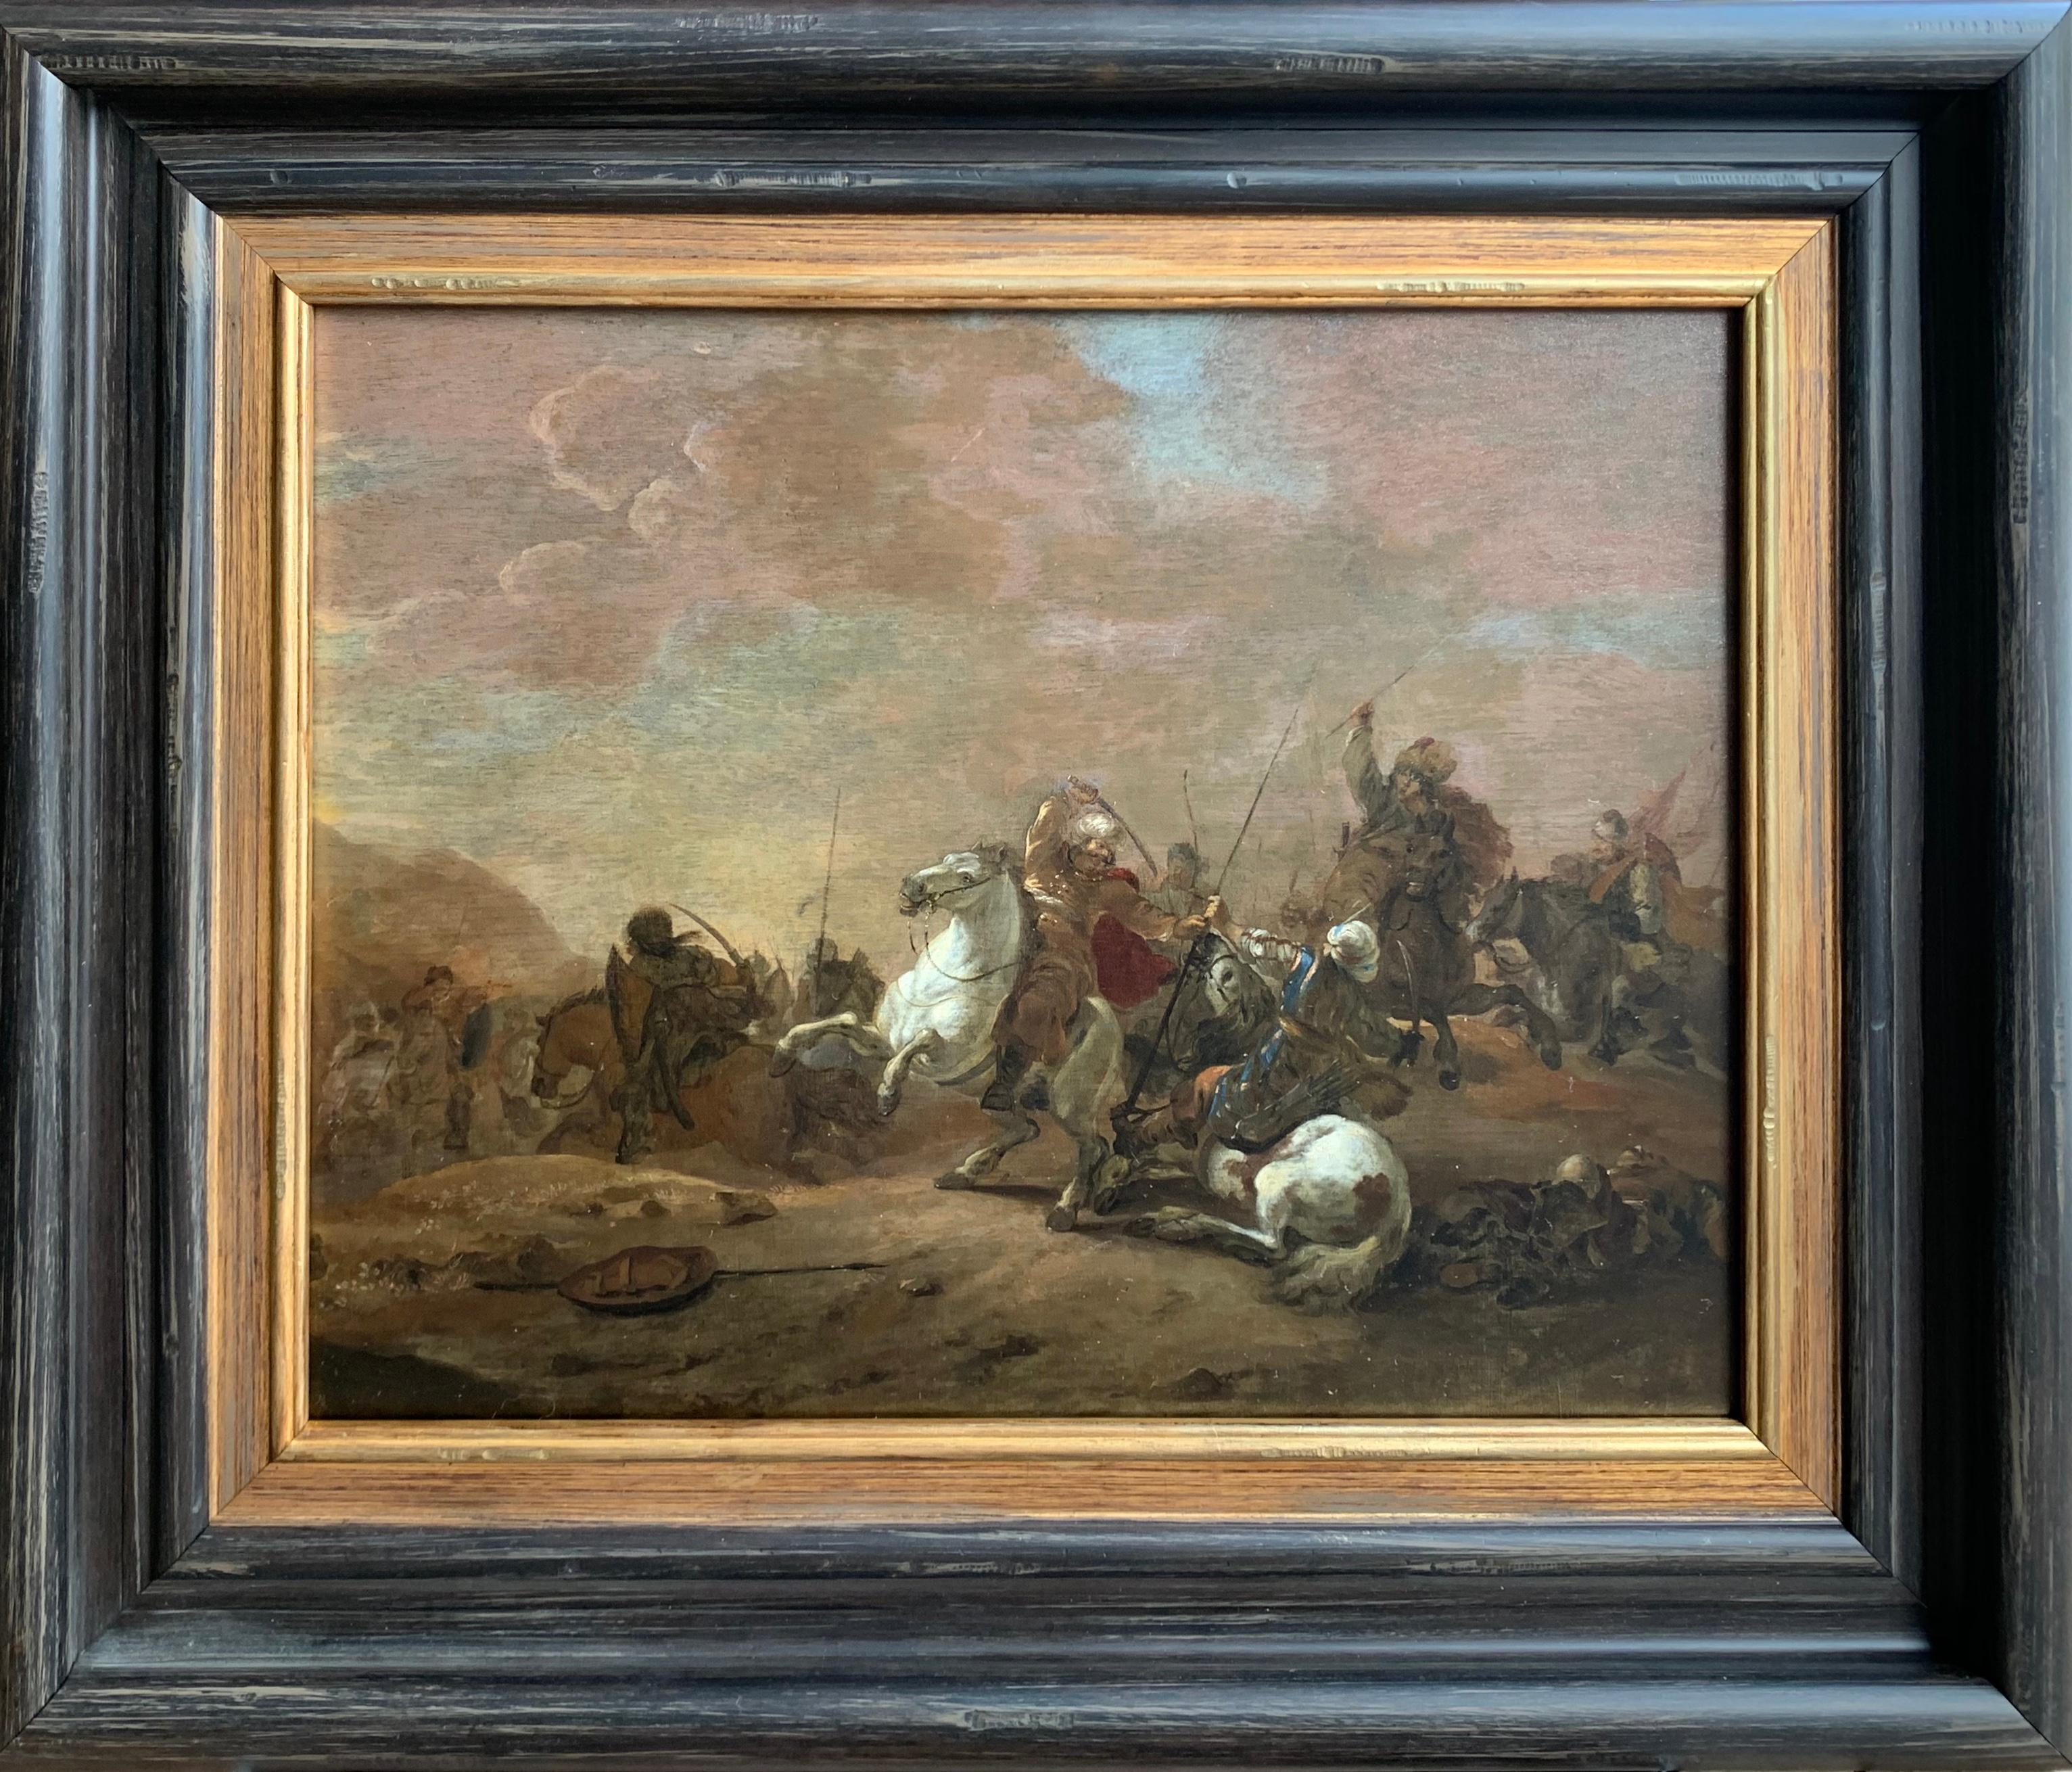 17th century orientalist battle - Orientalist Turkish Arabian Cavalry Skirmish